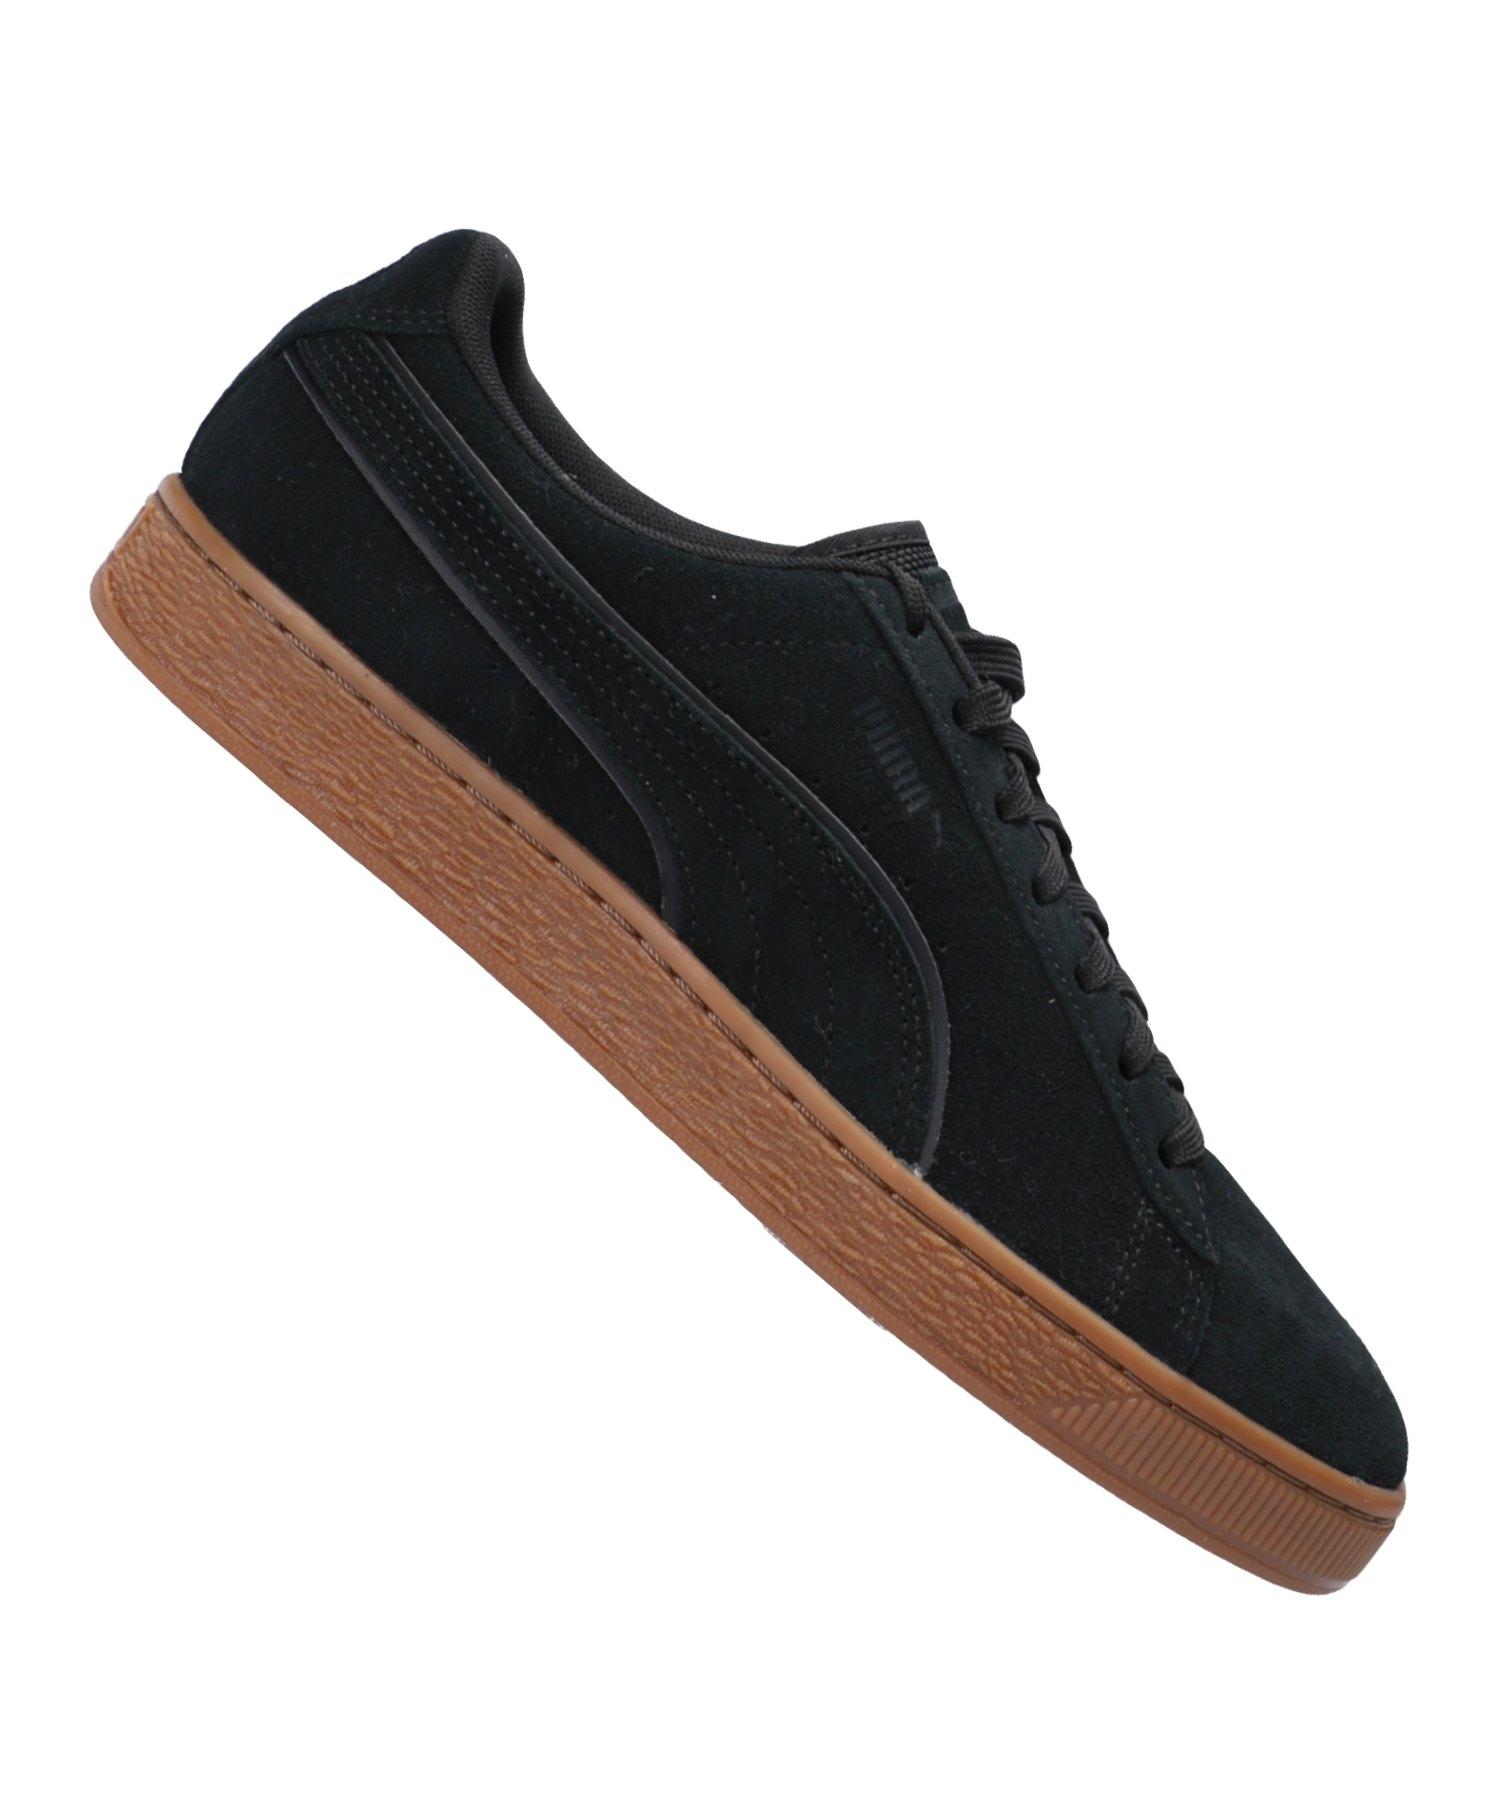 PUMA Suede Classic WTR Sneaker Schwarz F01 - Schwarz